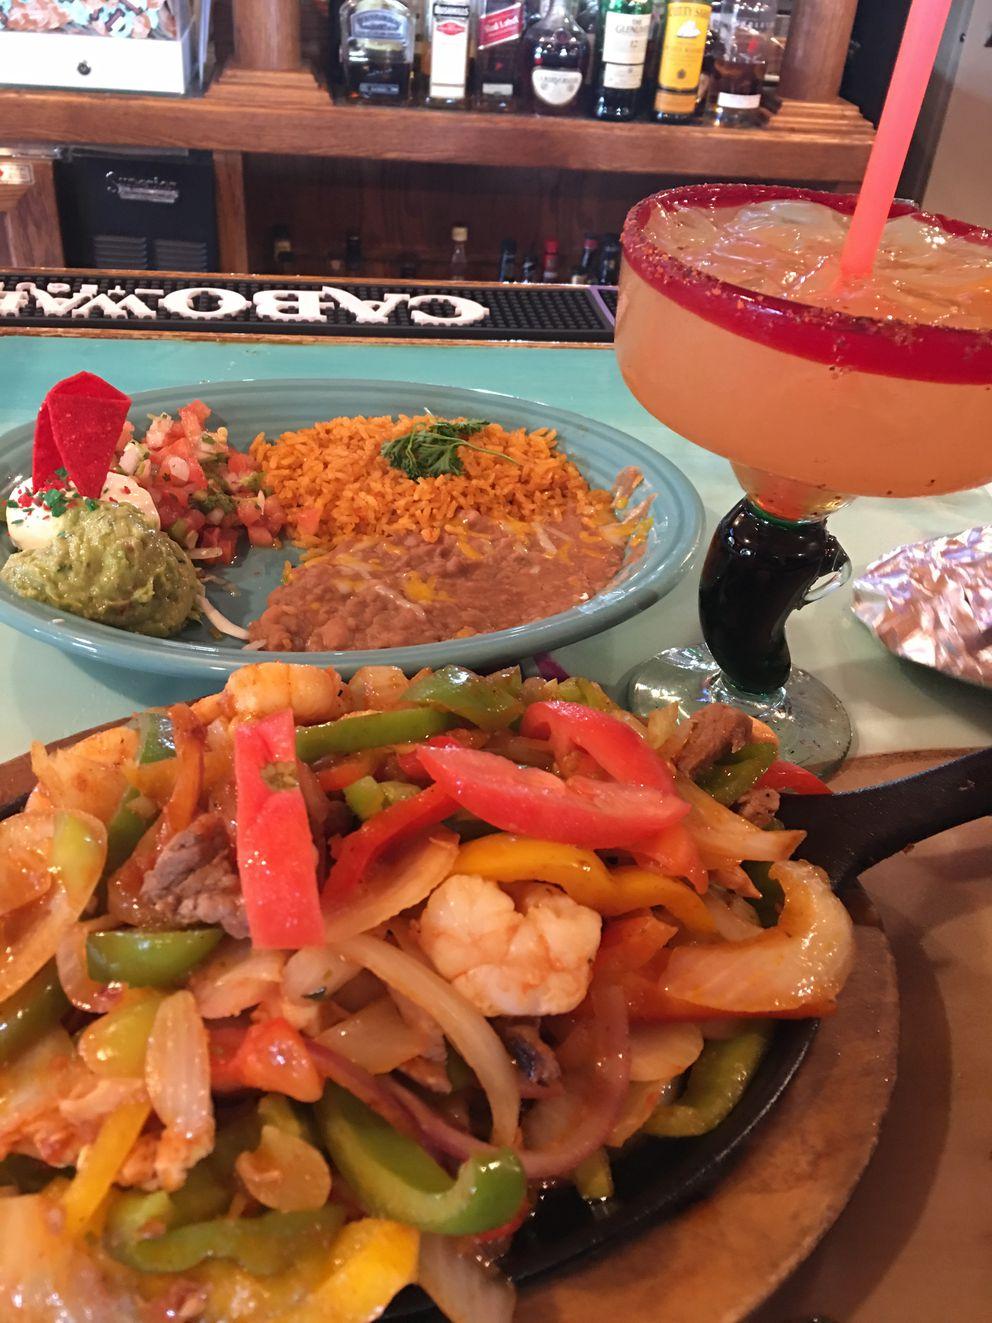 Mixta fajitas at Jalapenos Mexican Restaurant in South Anchorage (Photo by Mara Severin)